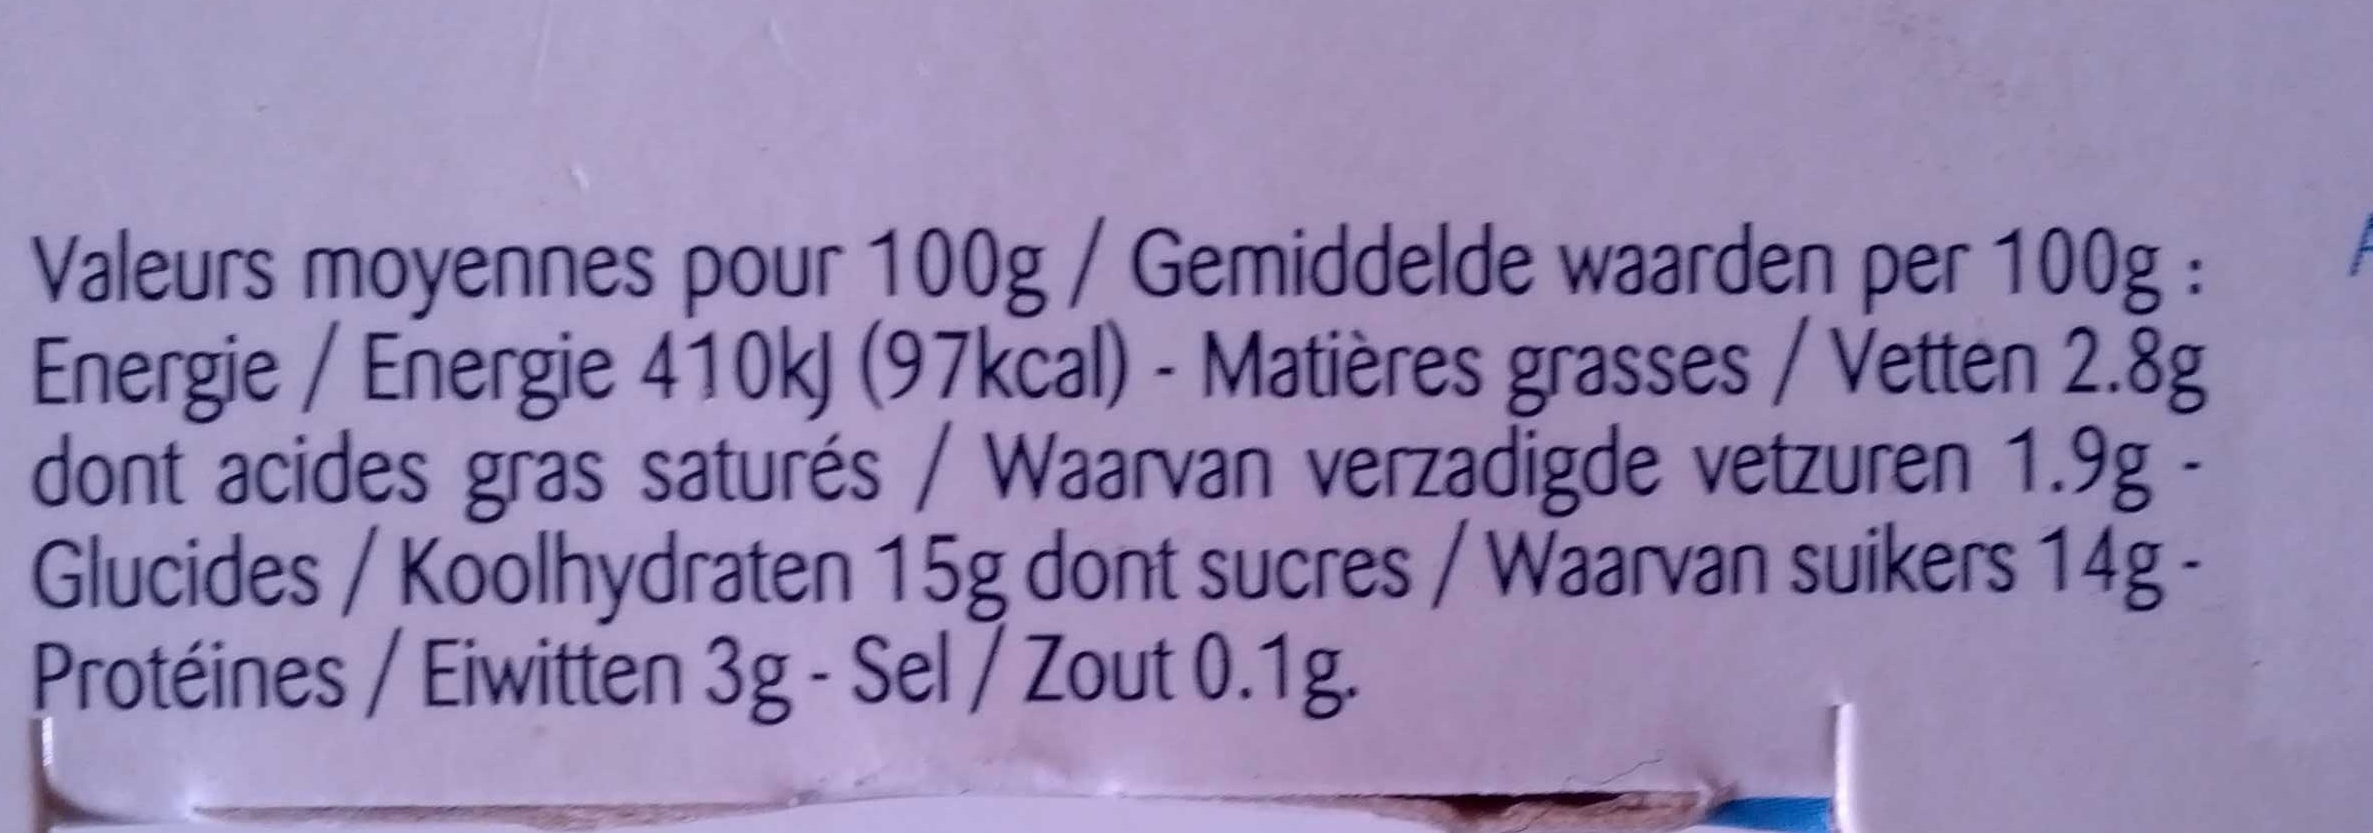 Fruits rouges : Fraise - Framboise - Myrtille - Nutrition facts